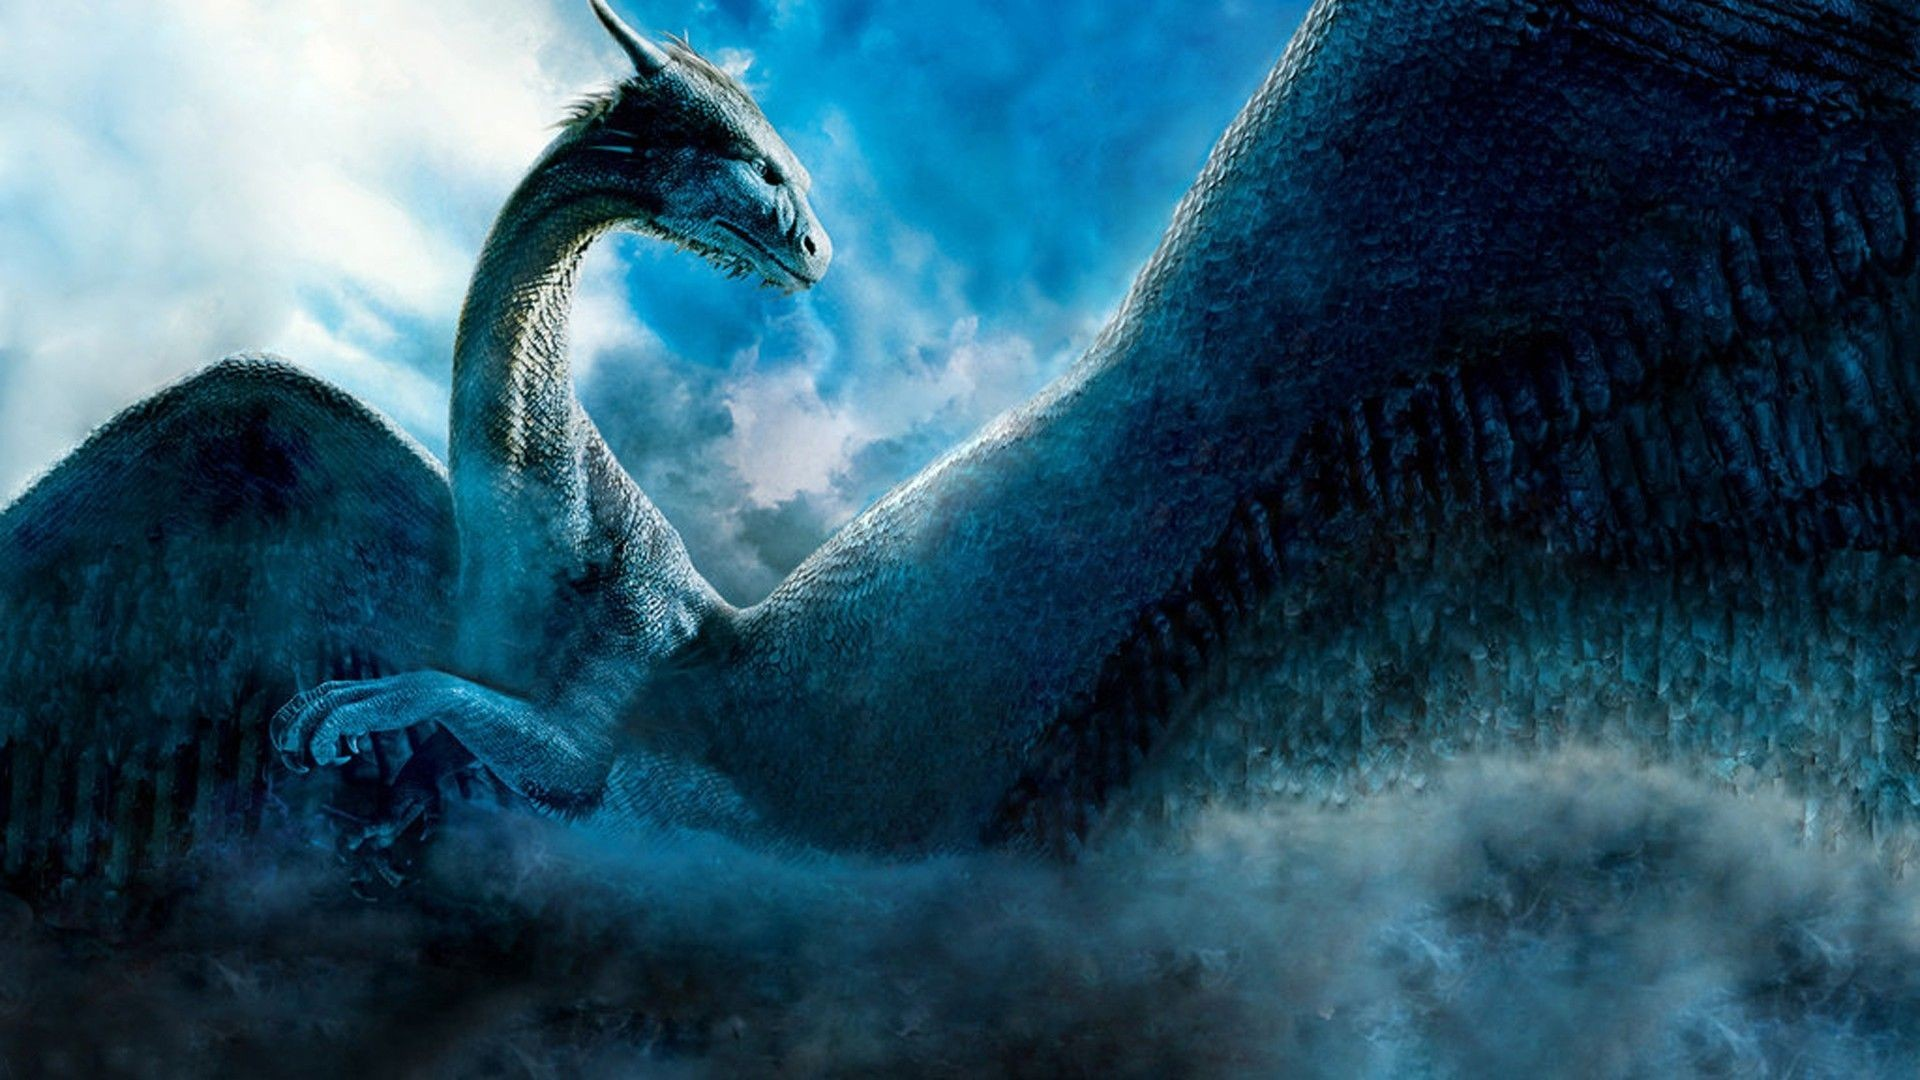 Dragon Wallpaper Widescreen 71 Pictures